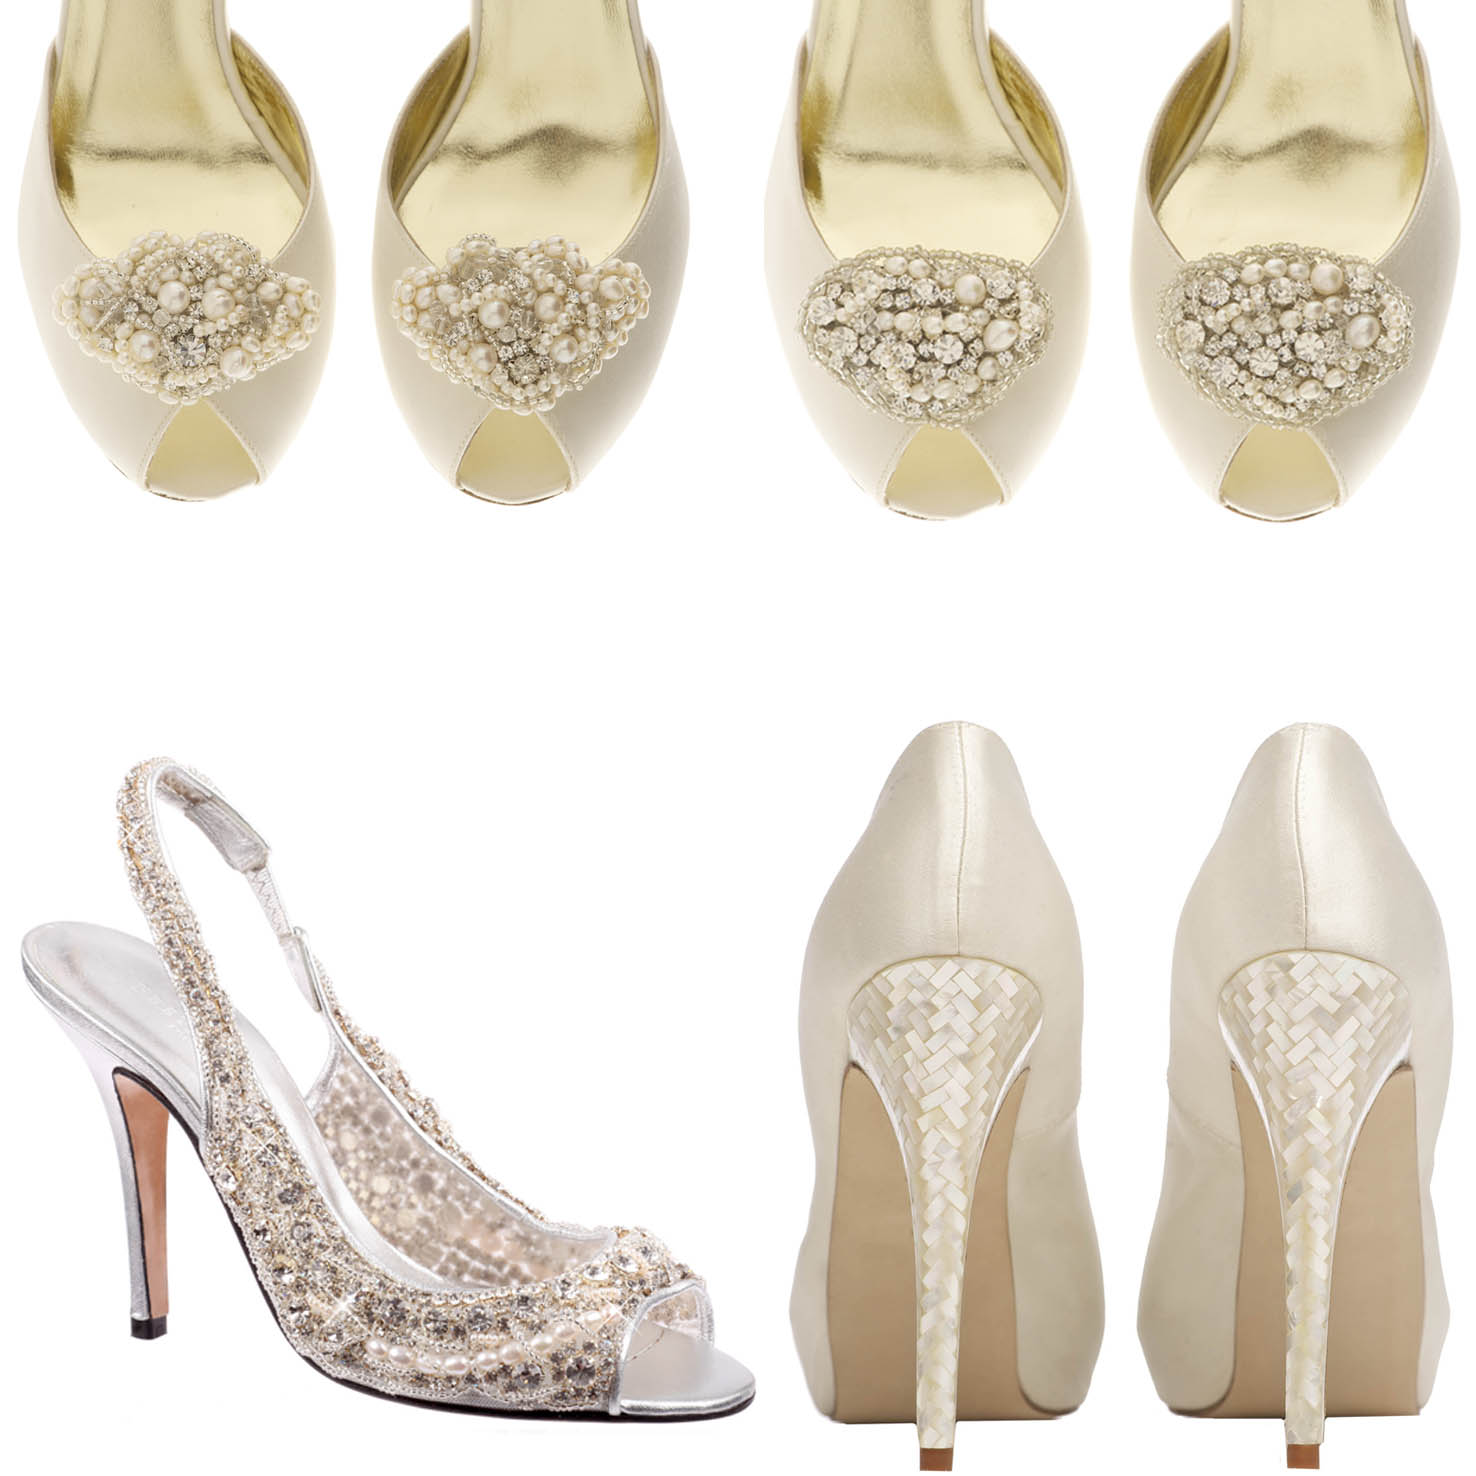 diamonds and pearls theme - photo #28